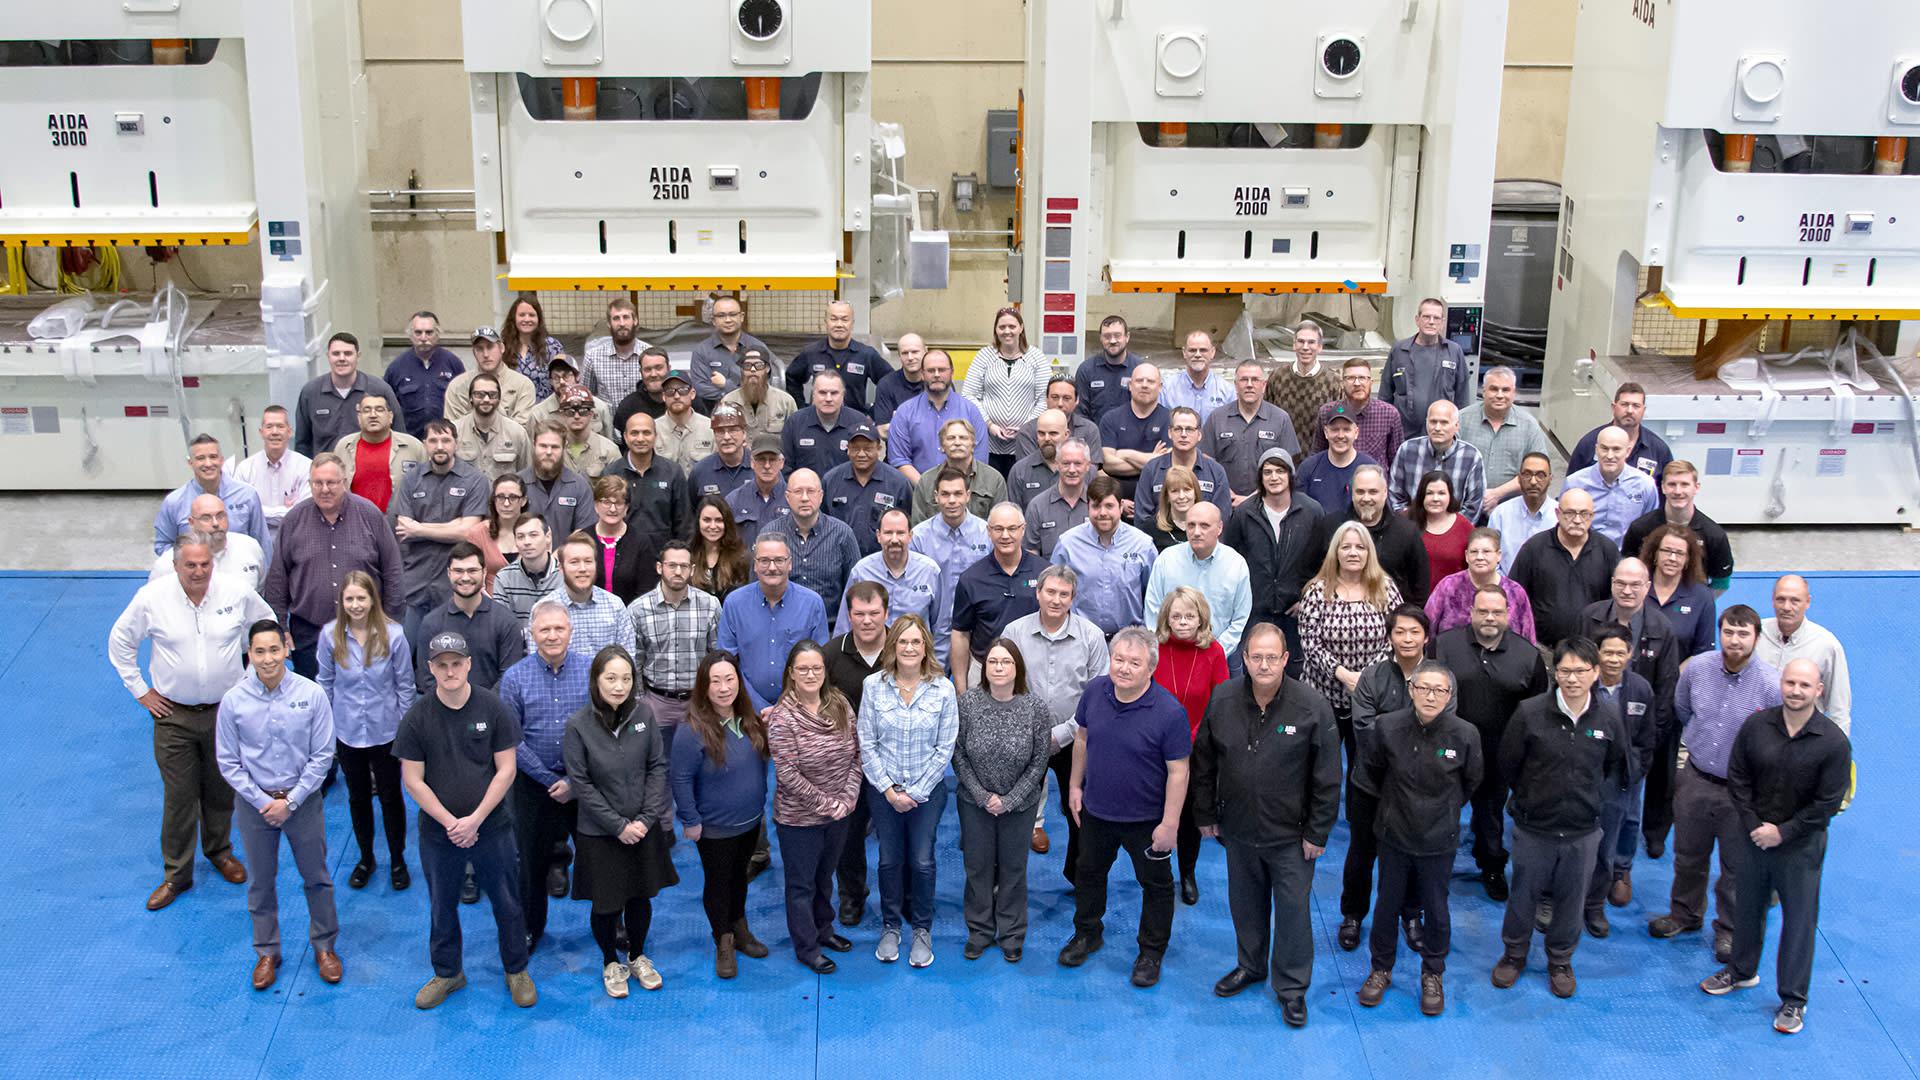 AIDA-America 180,000 sq. ft. Advanced Manufacturing Facility